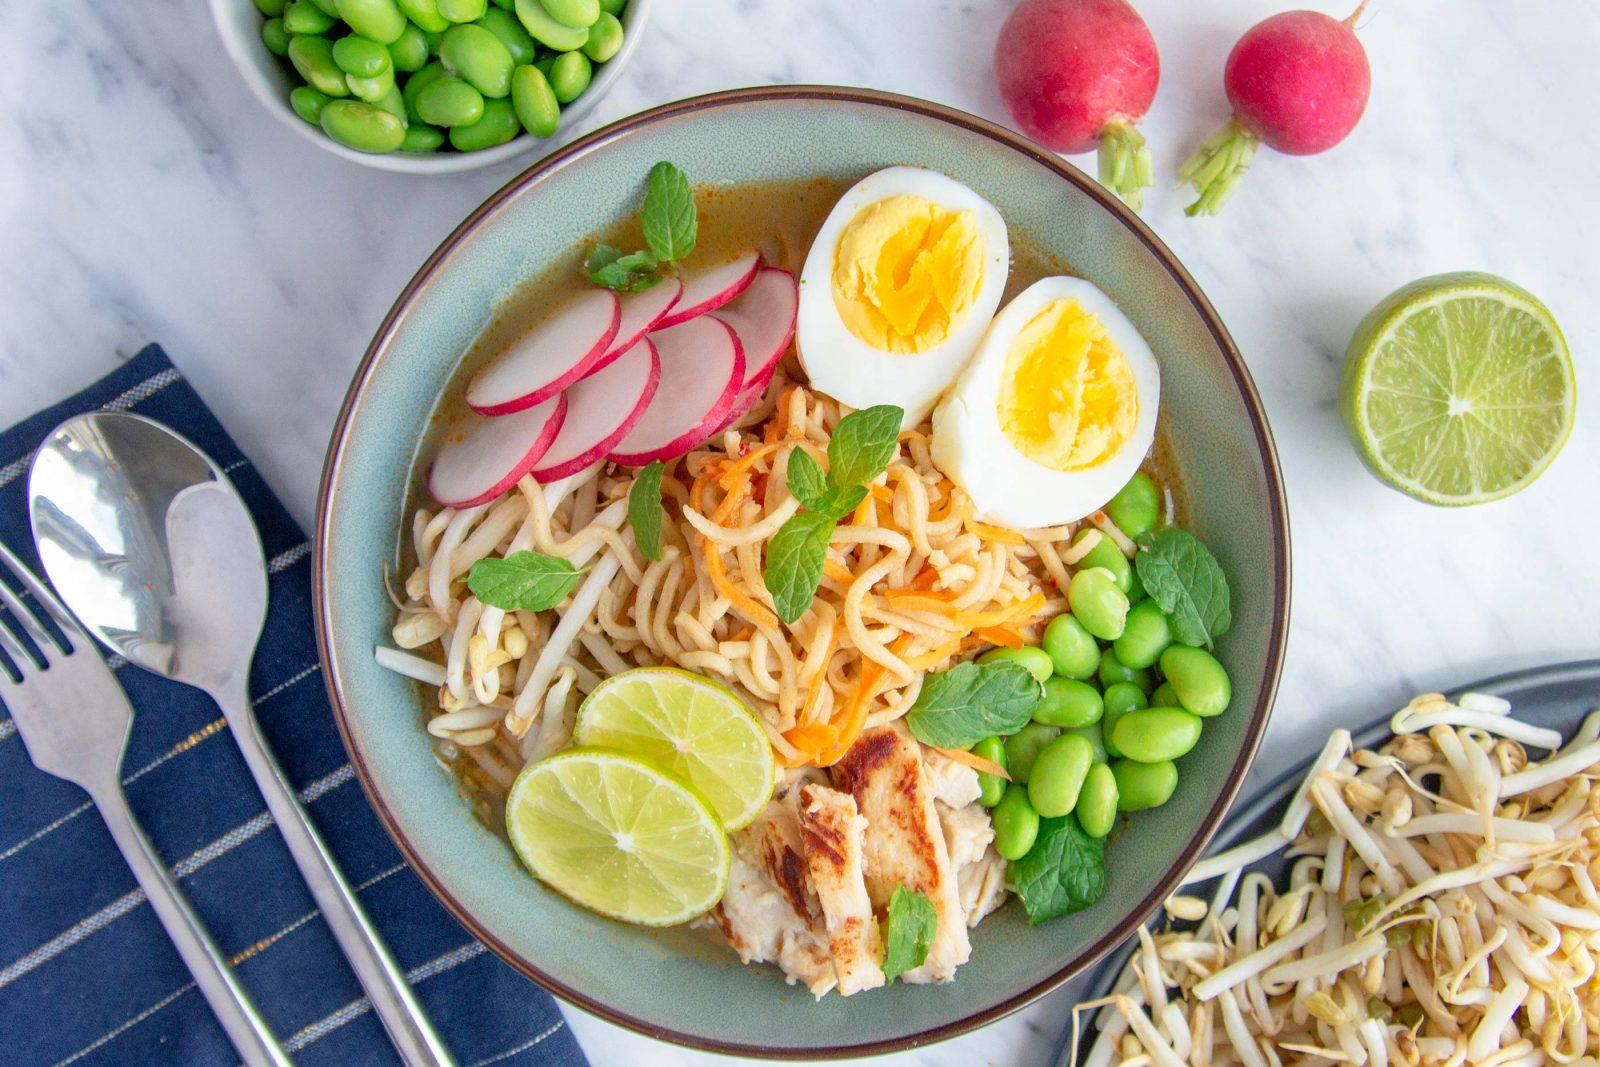 Max 15 min.: Hurtig ramensuppe med stegt kylling og æg